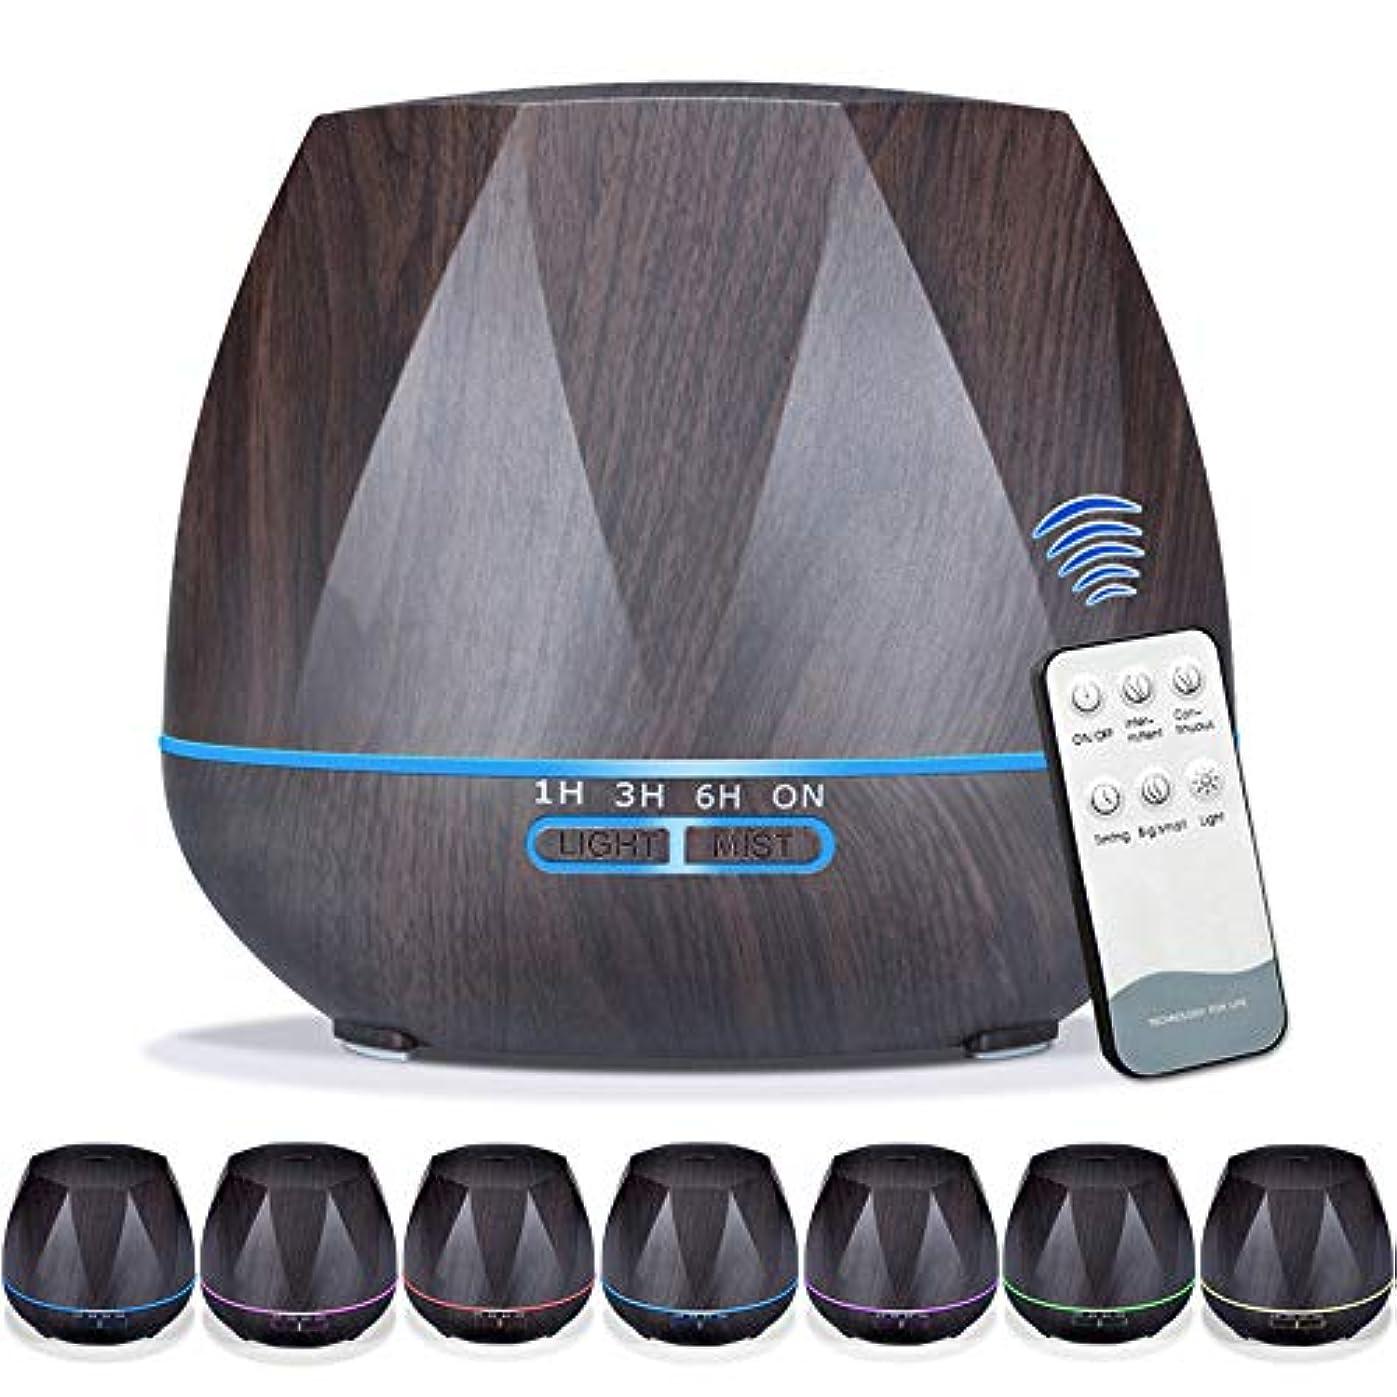 550mlエッセンシャルオイルディフューザー5に1アロマセラピー超音波クールミスト加湿器ルーム空気香りホームオフィスギフト用,EUplug